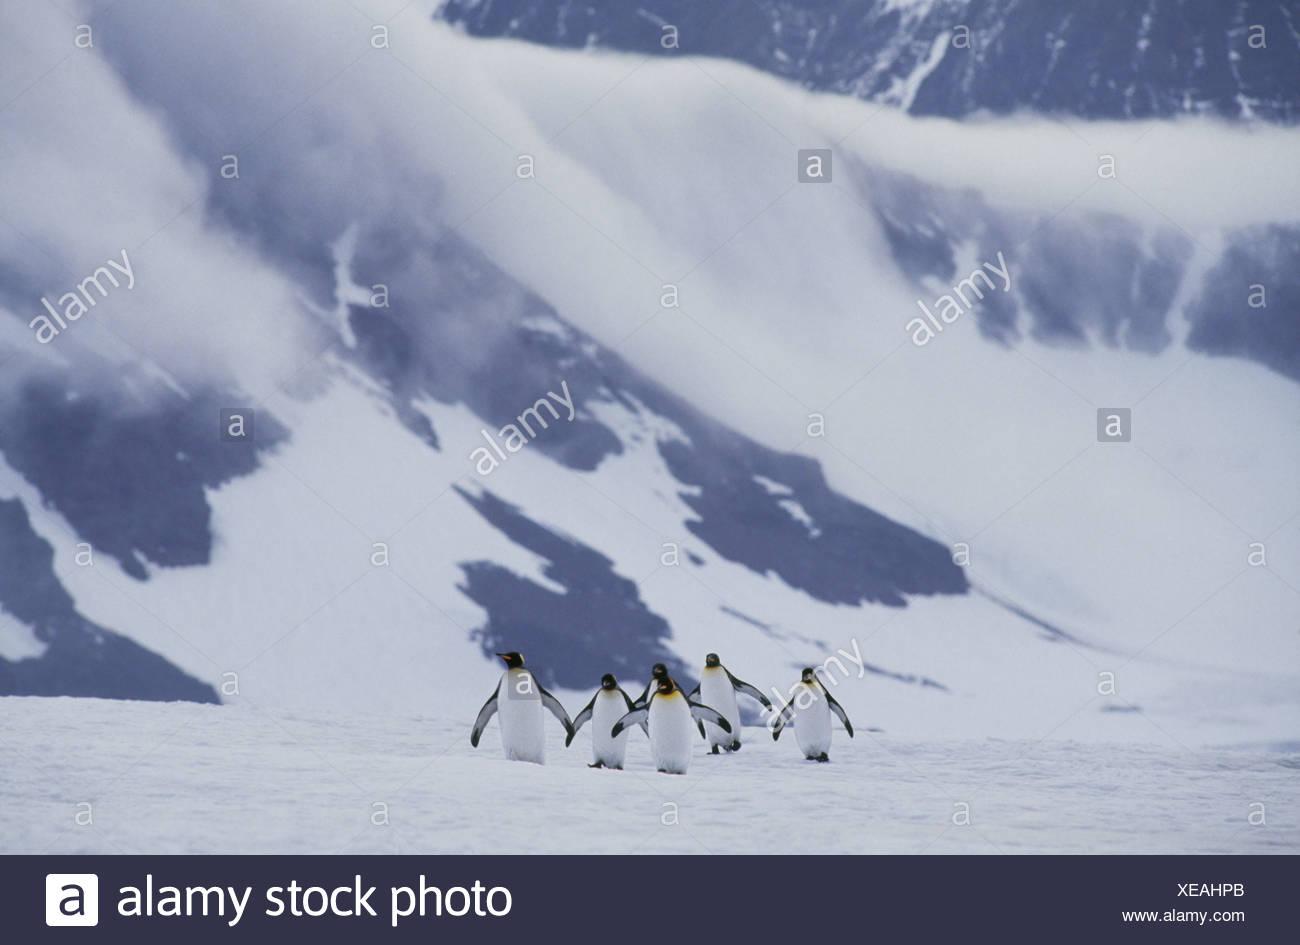 South Georgia Island King penguins crossing ice Aptenodytes patagonicus - Stock Image